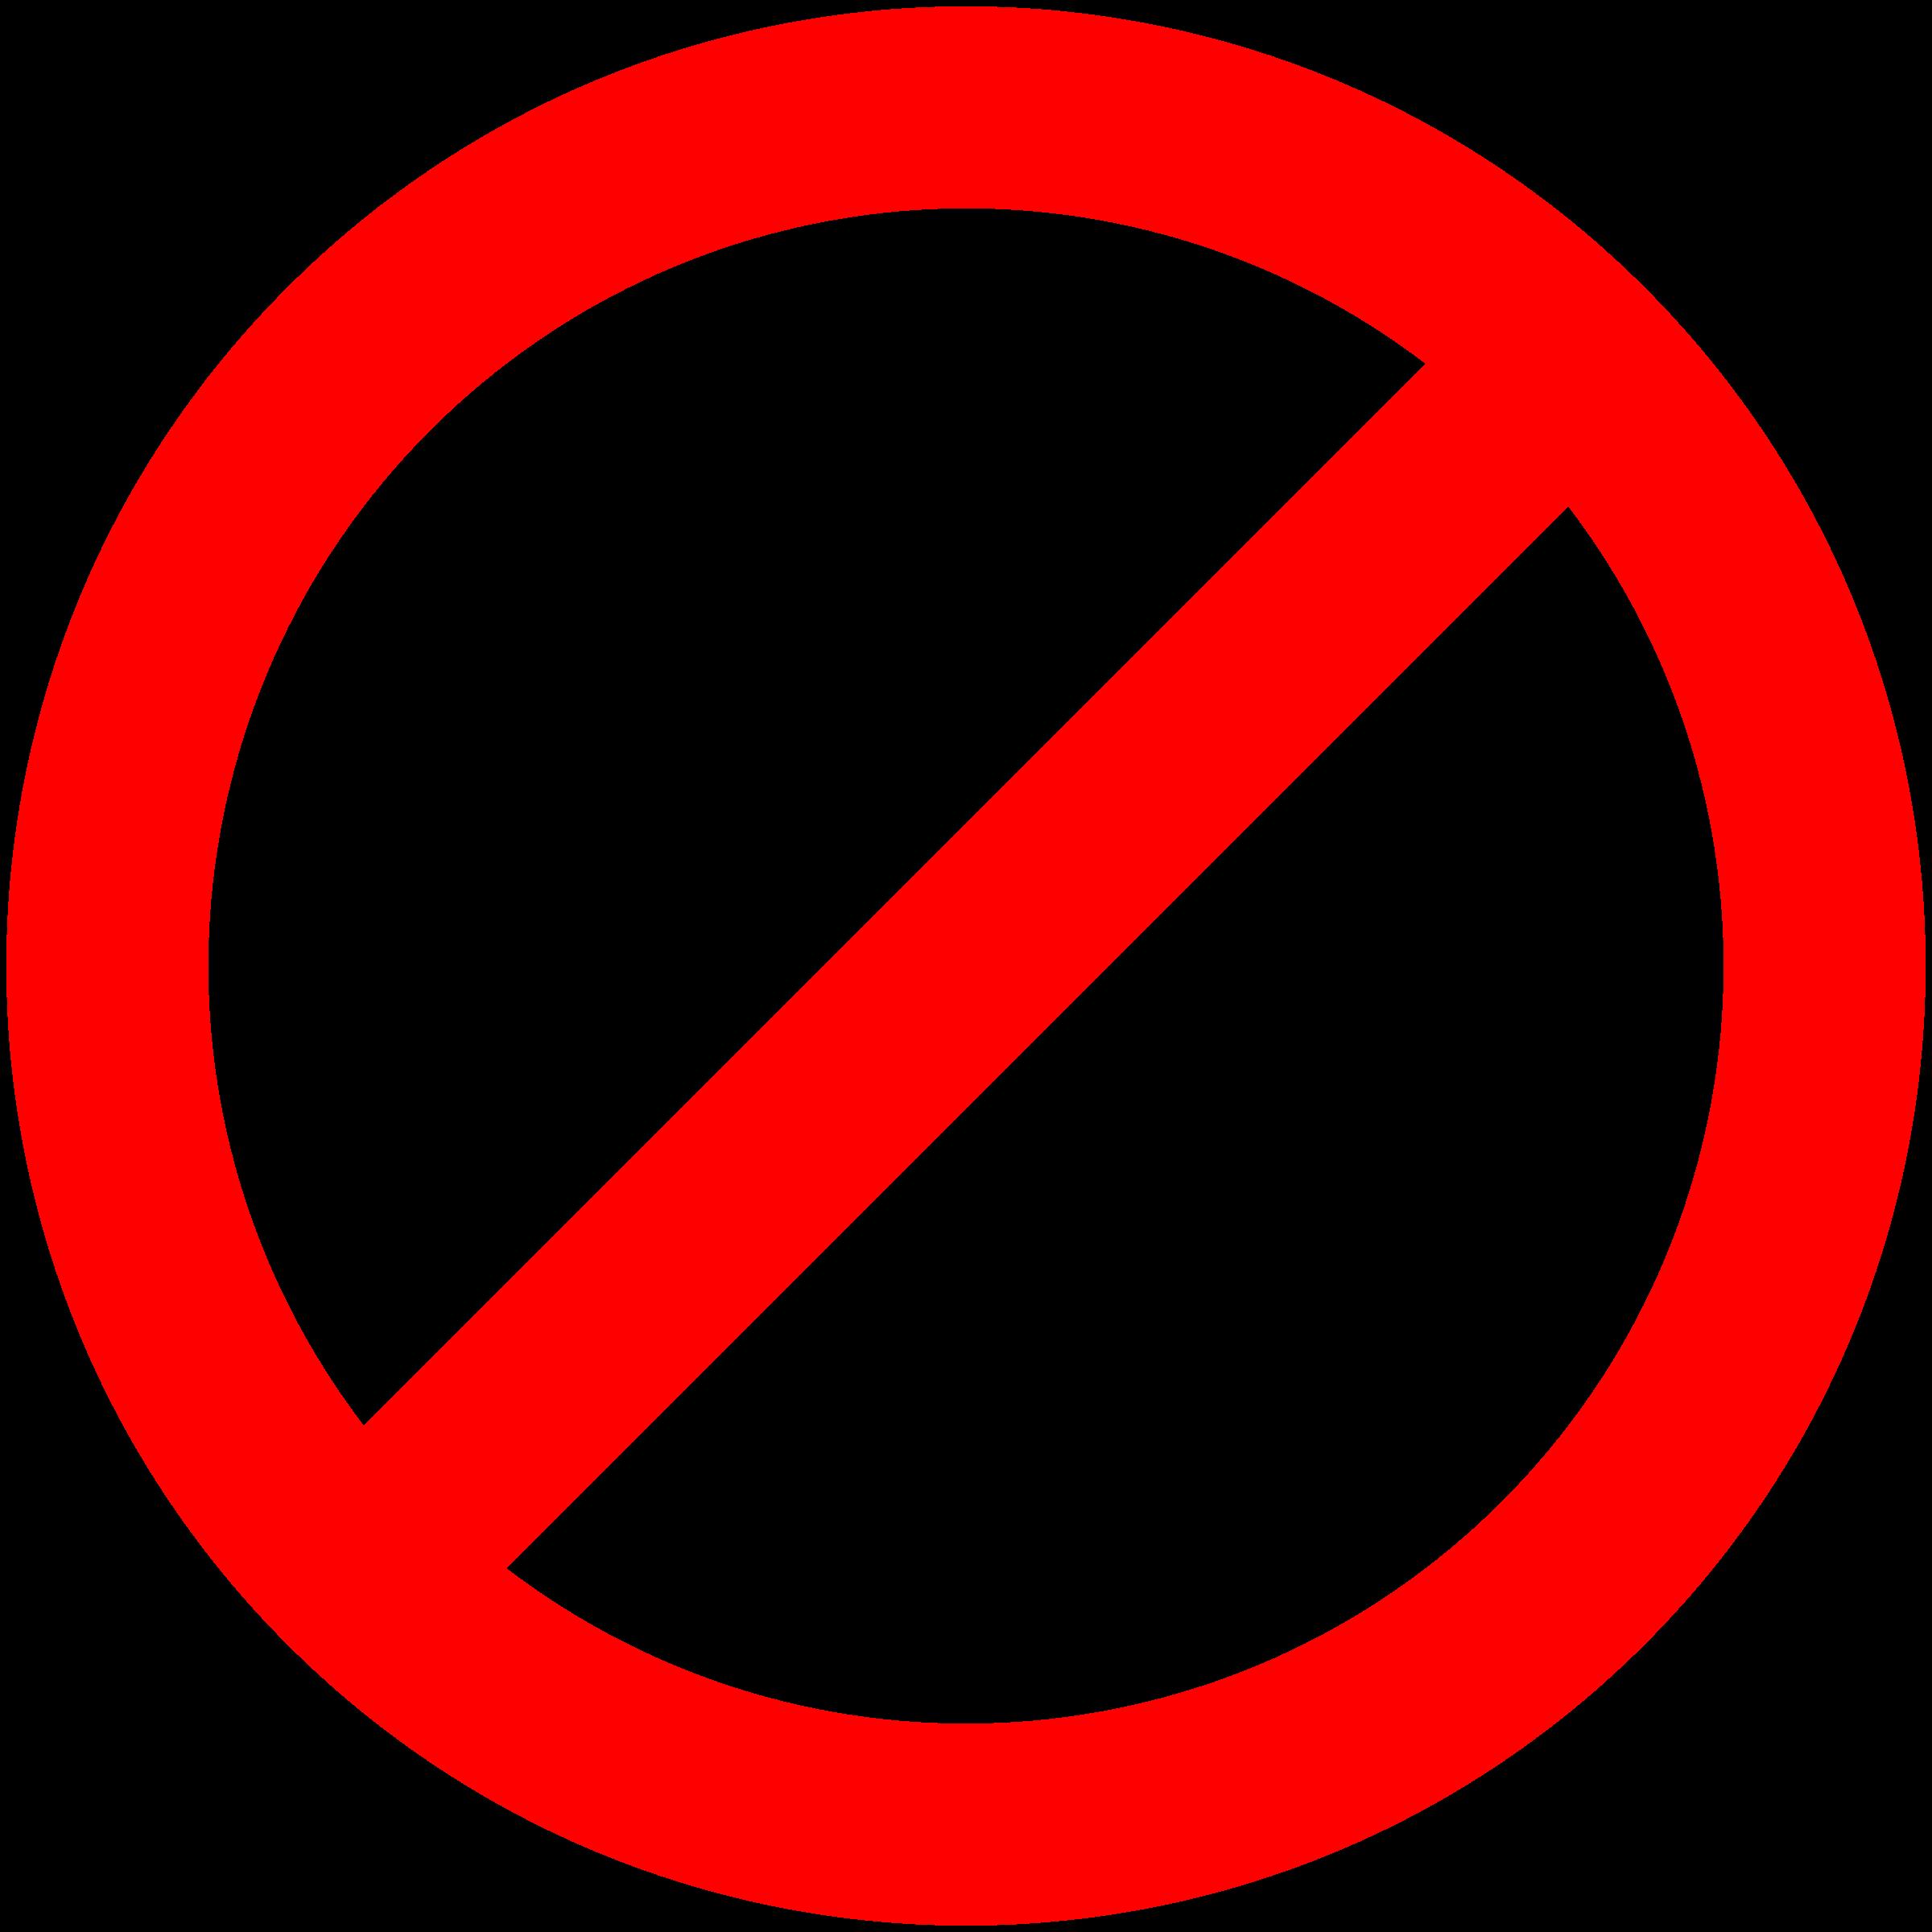 no clipart clipground